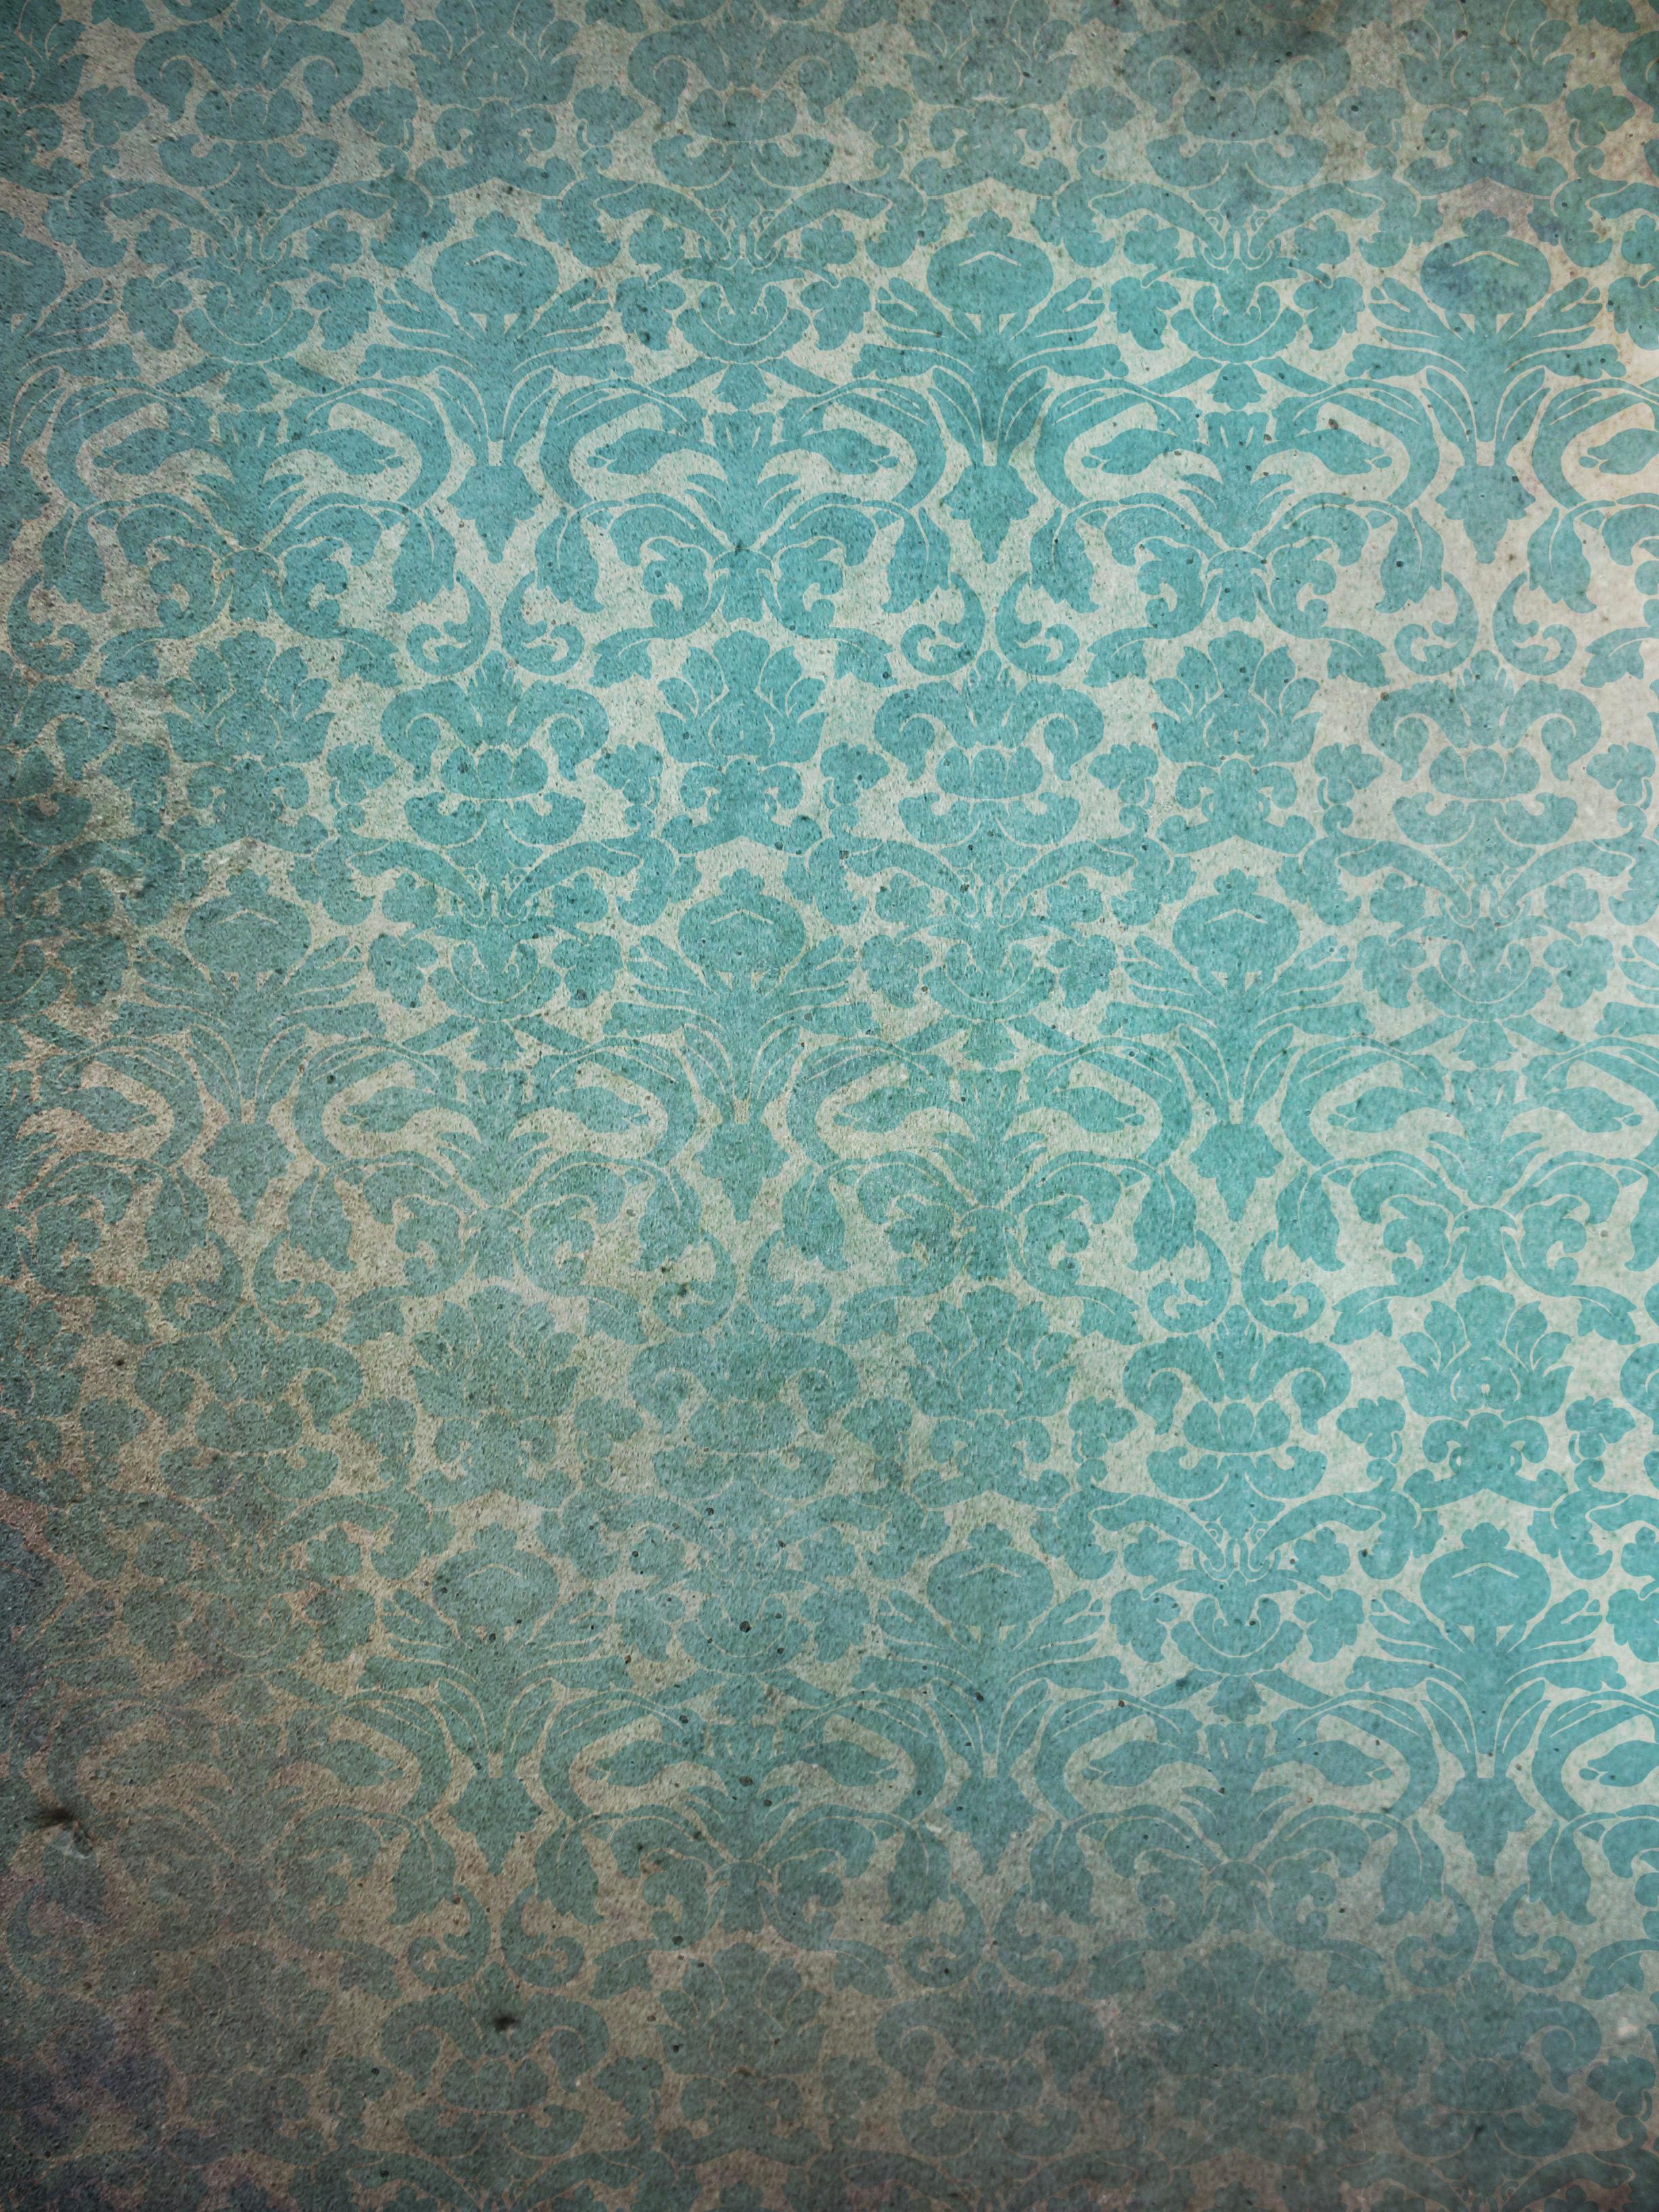 Free Vintage Paper Wallpaper Texture Texture